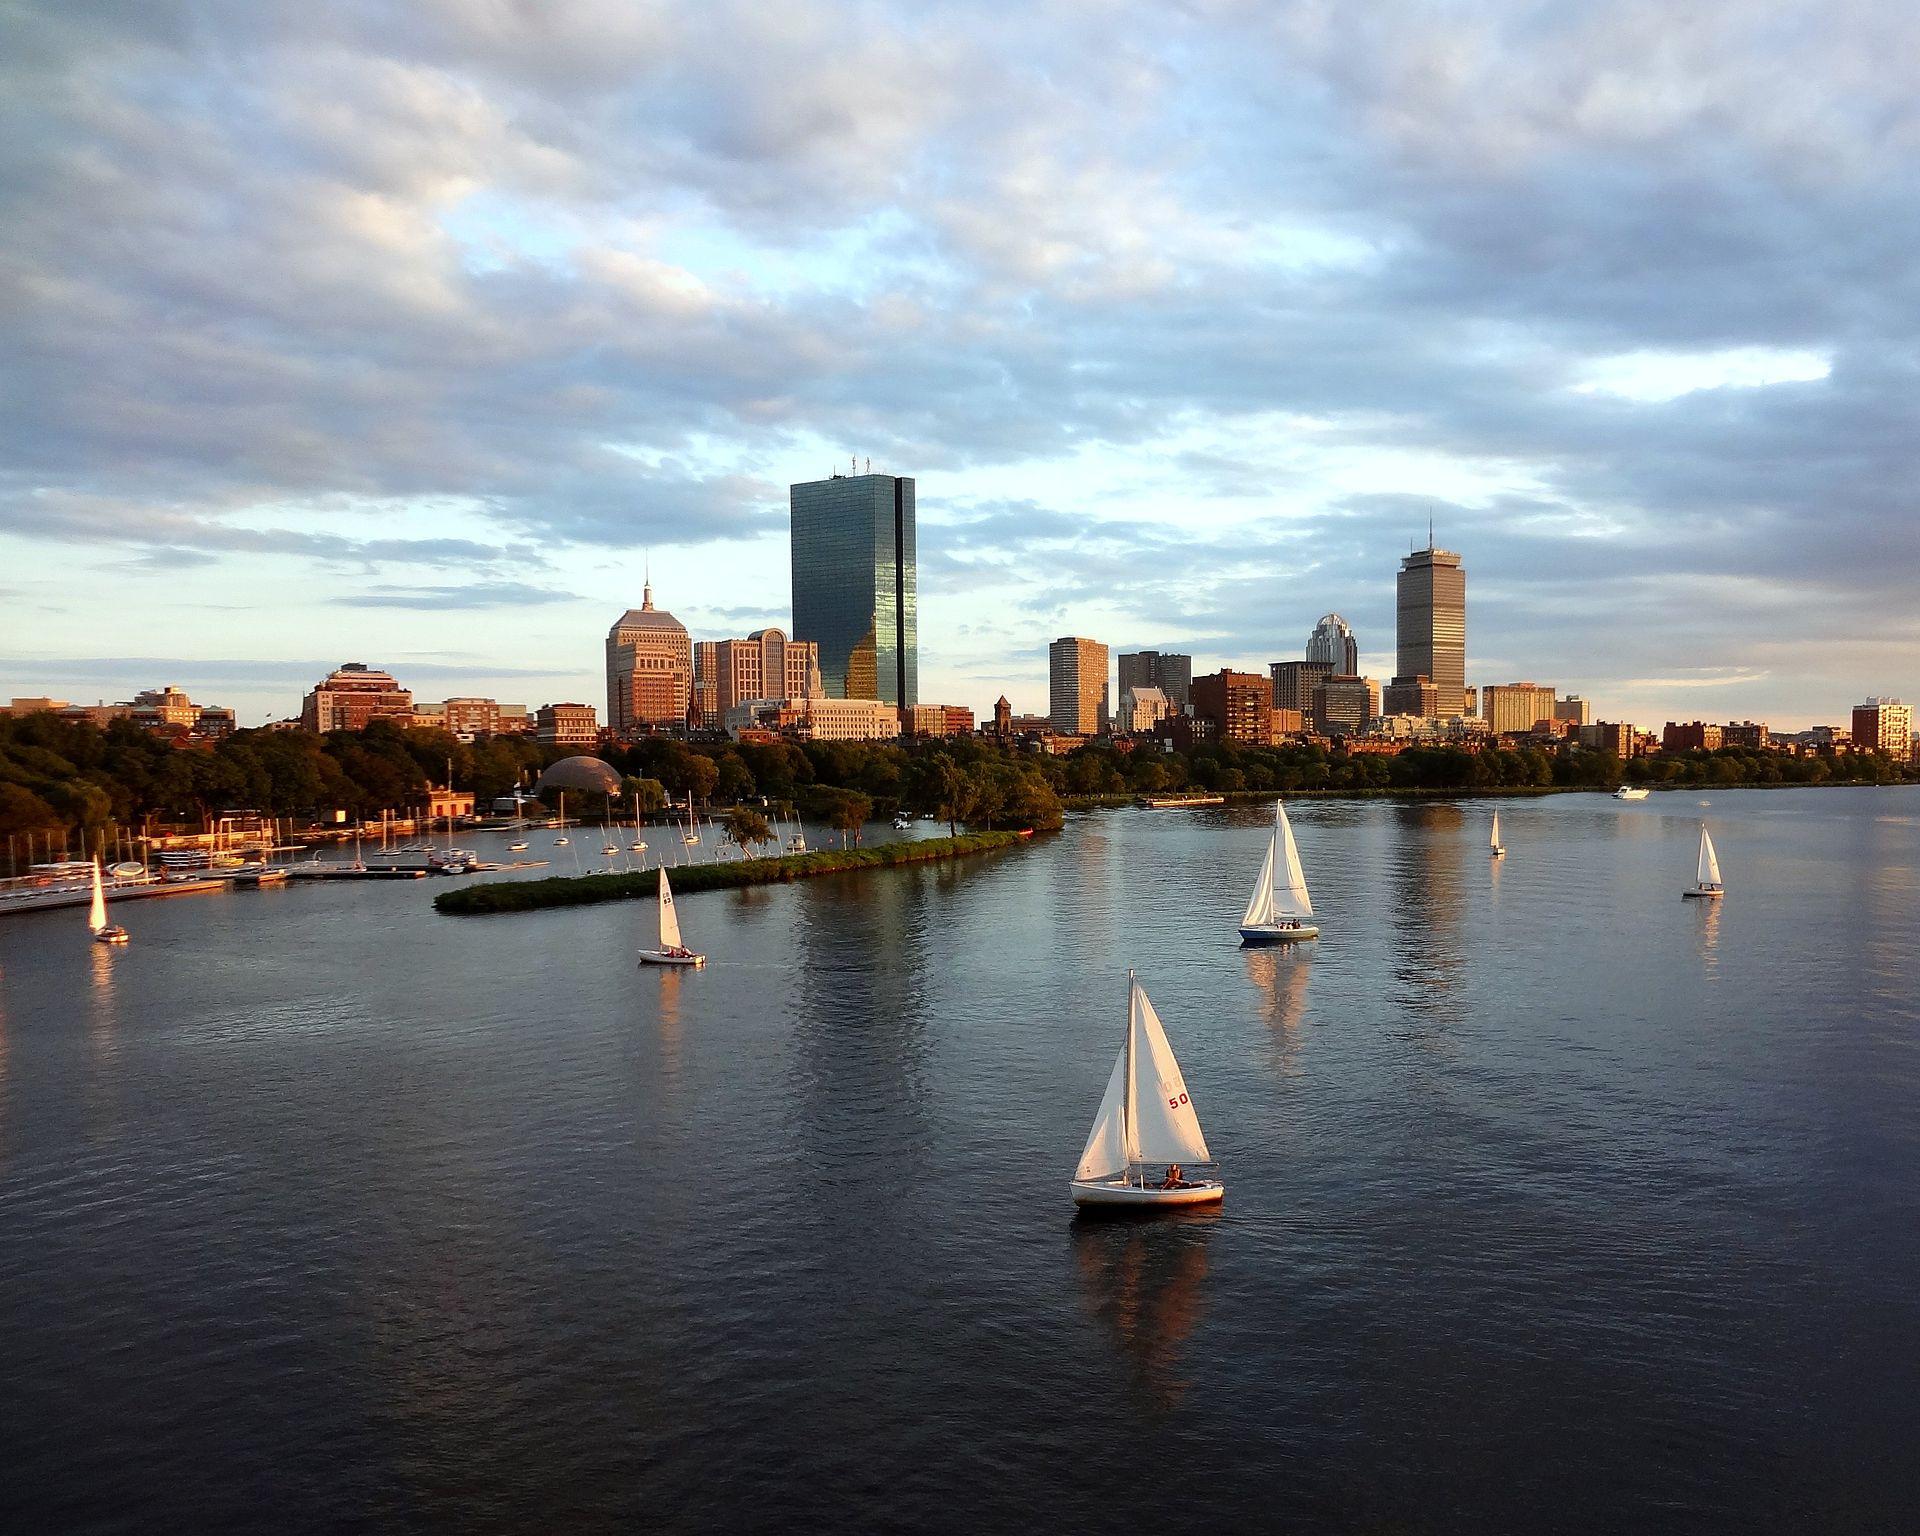 Hotels In Boston >> Back Bay, Boston - Wikipedia